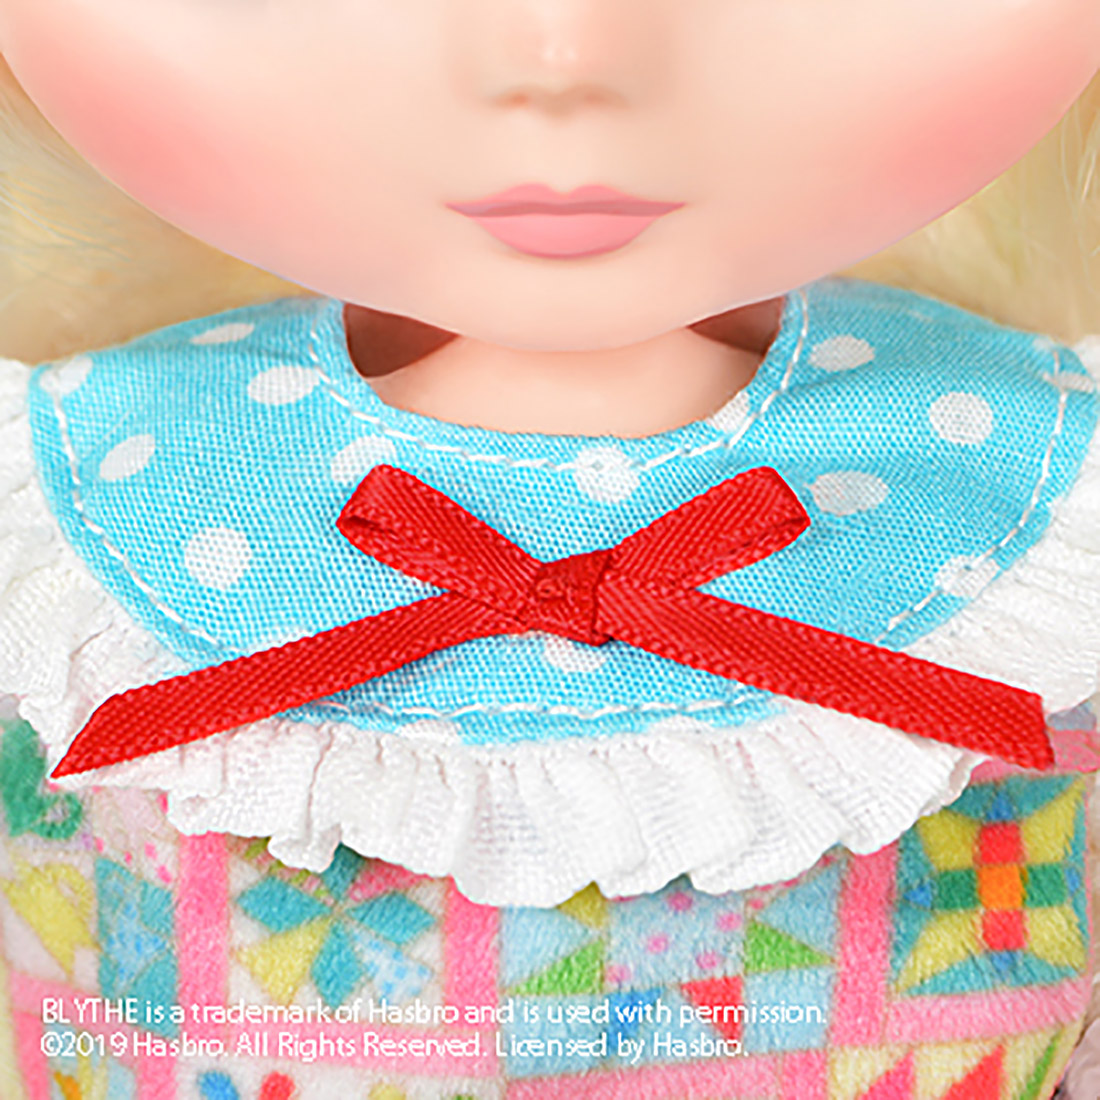 【SHOP限定】ミディブライス『ピーチー・カドリー・クー』ドール-006